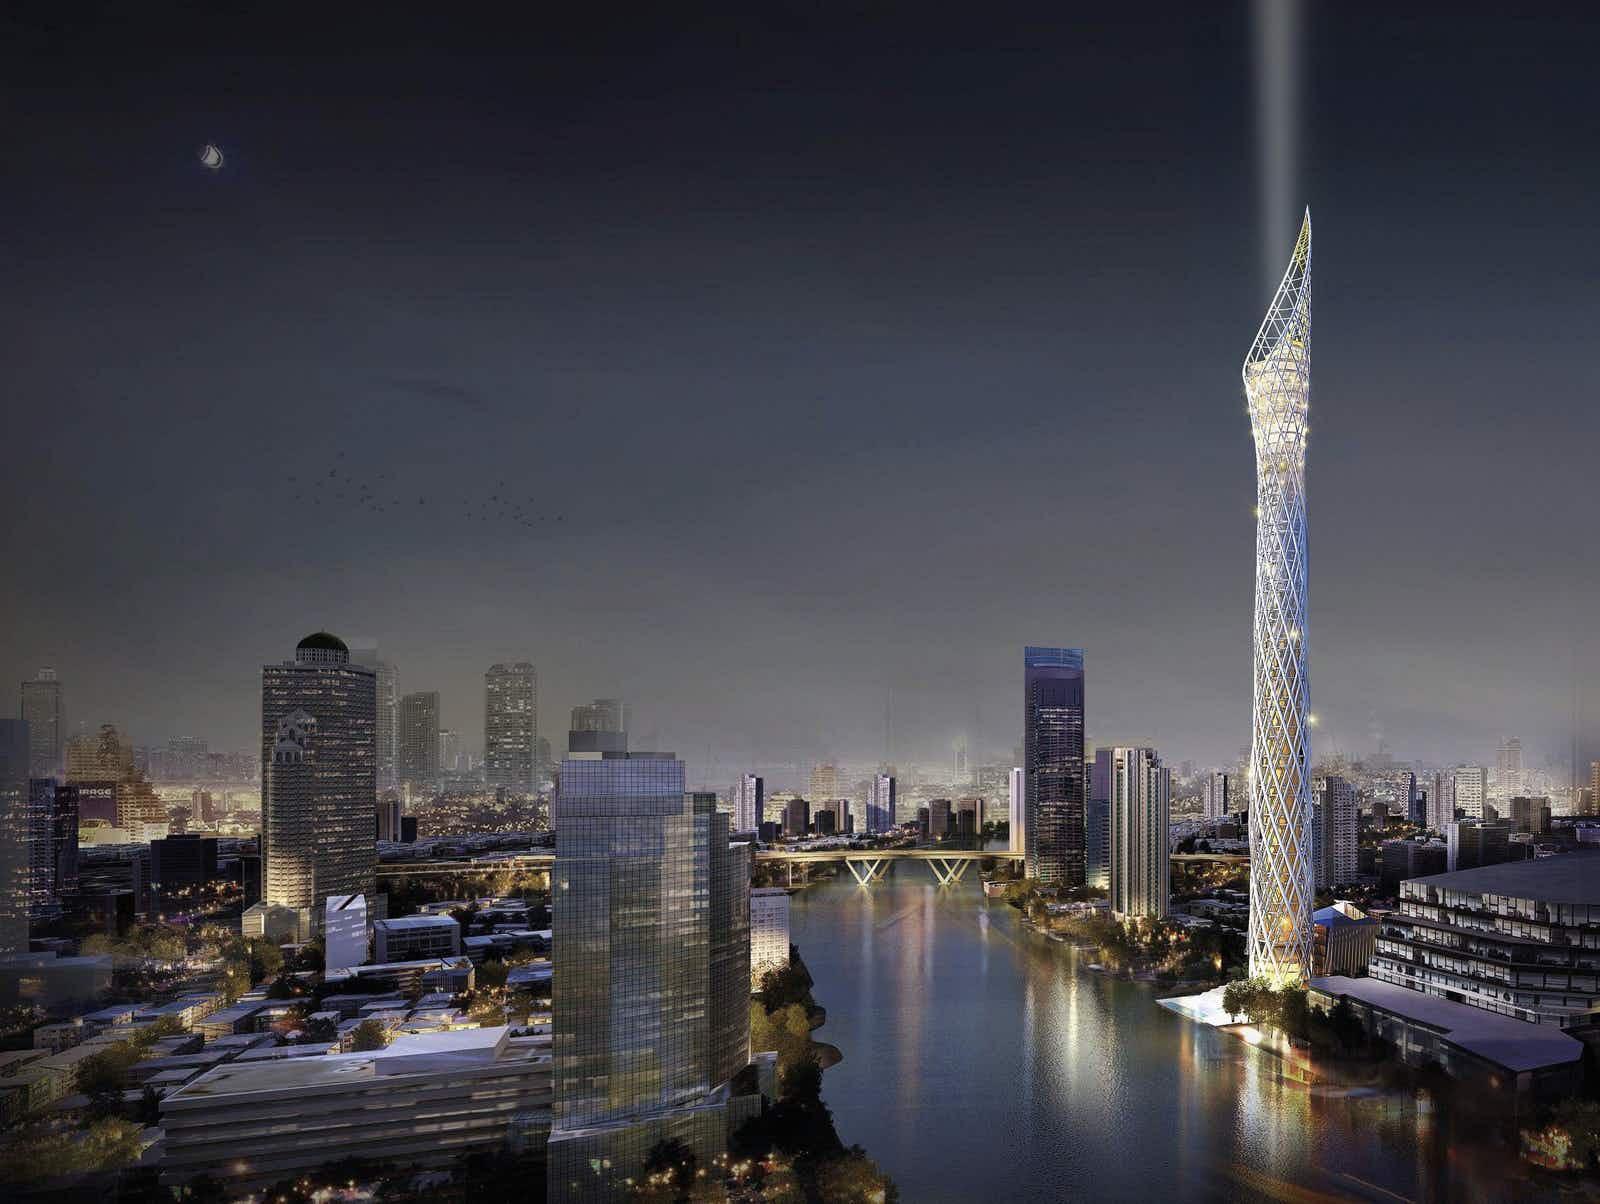 Bangkok Observation Tower (PRNewsfoto/The Chao Phraya River Tourism A)